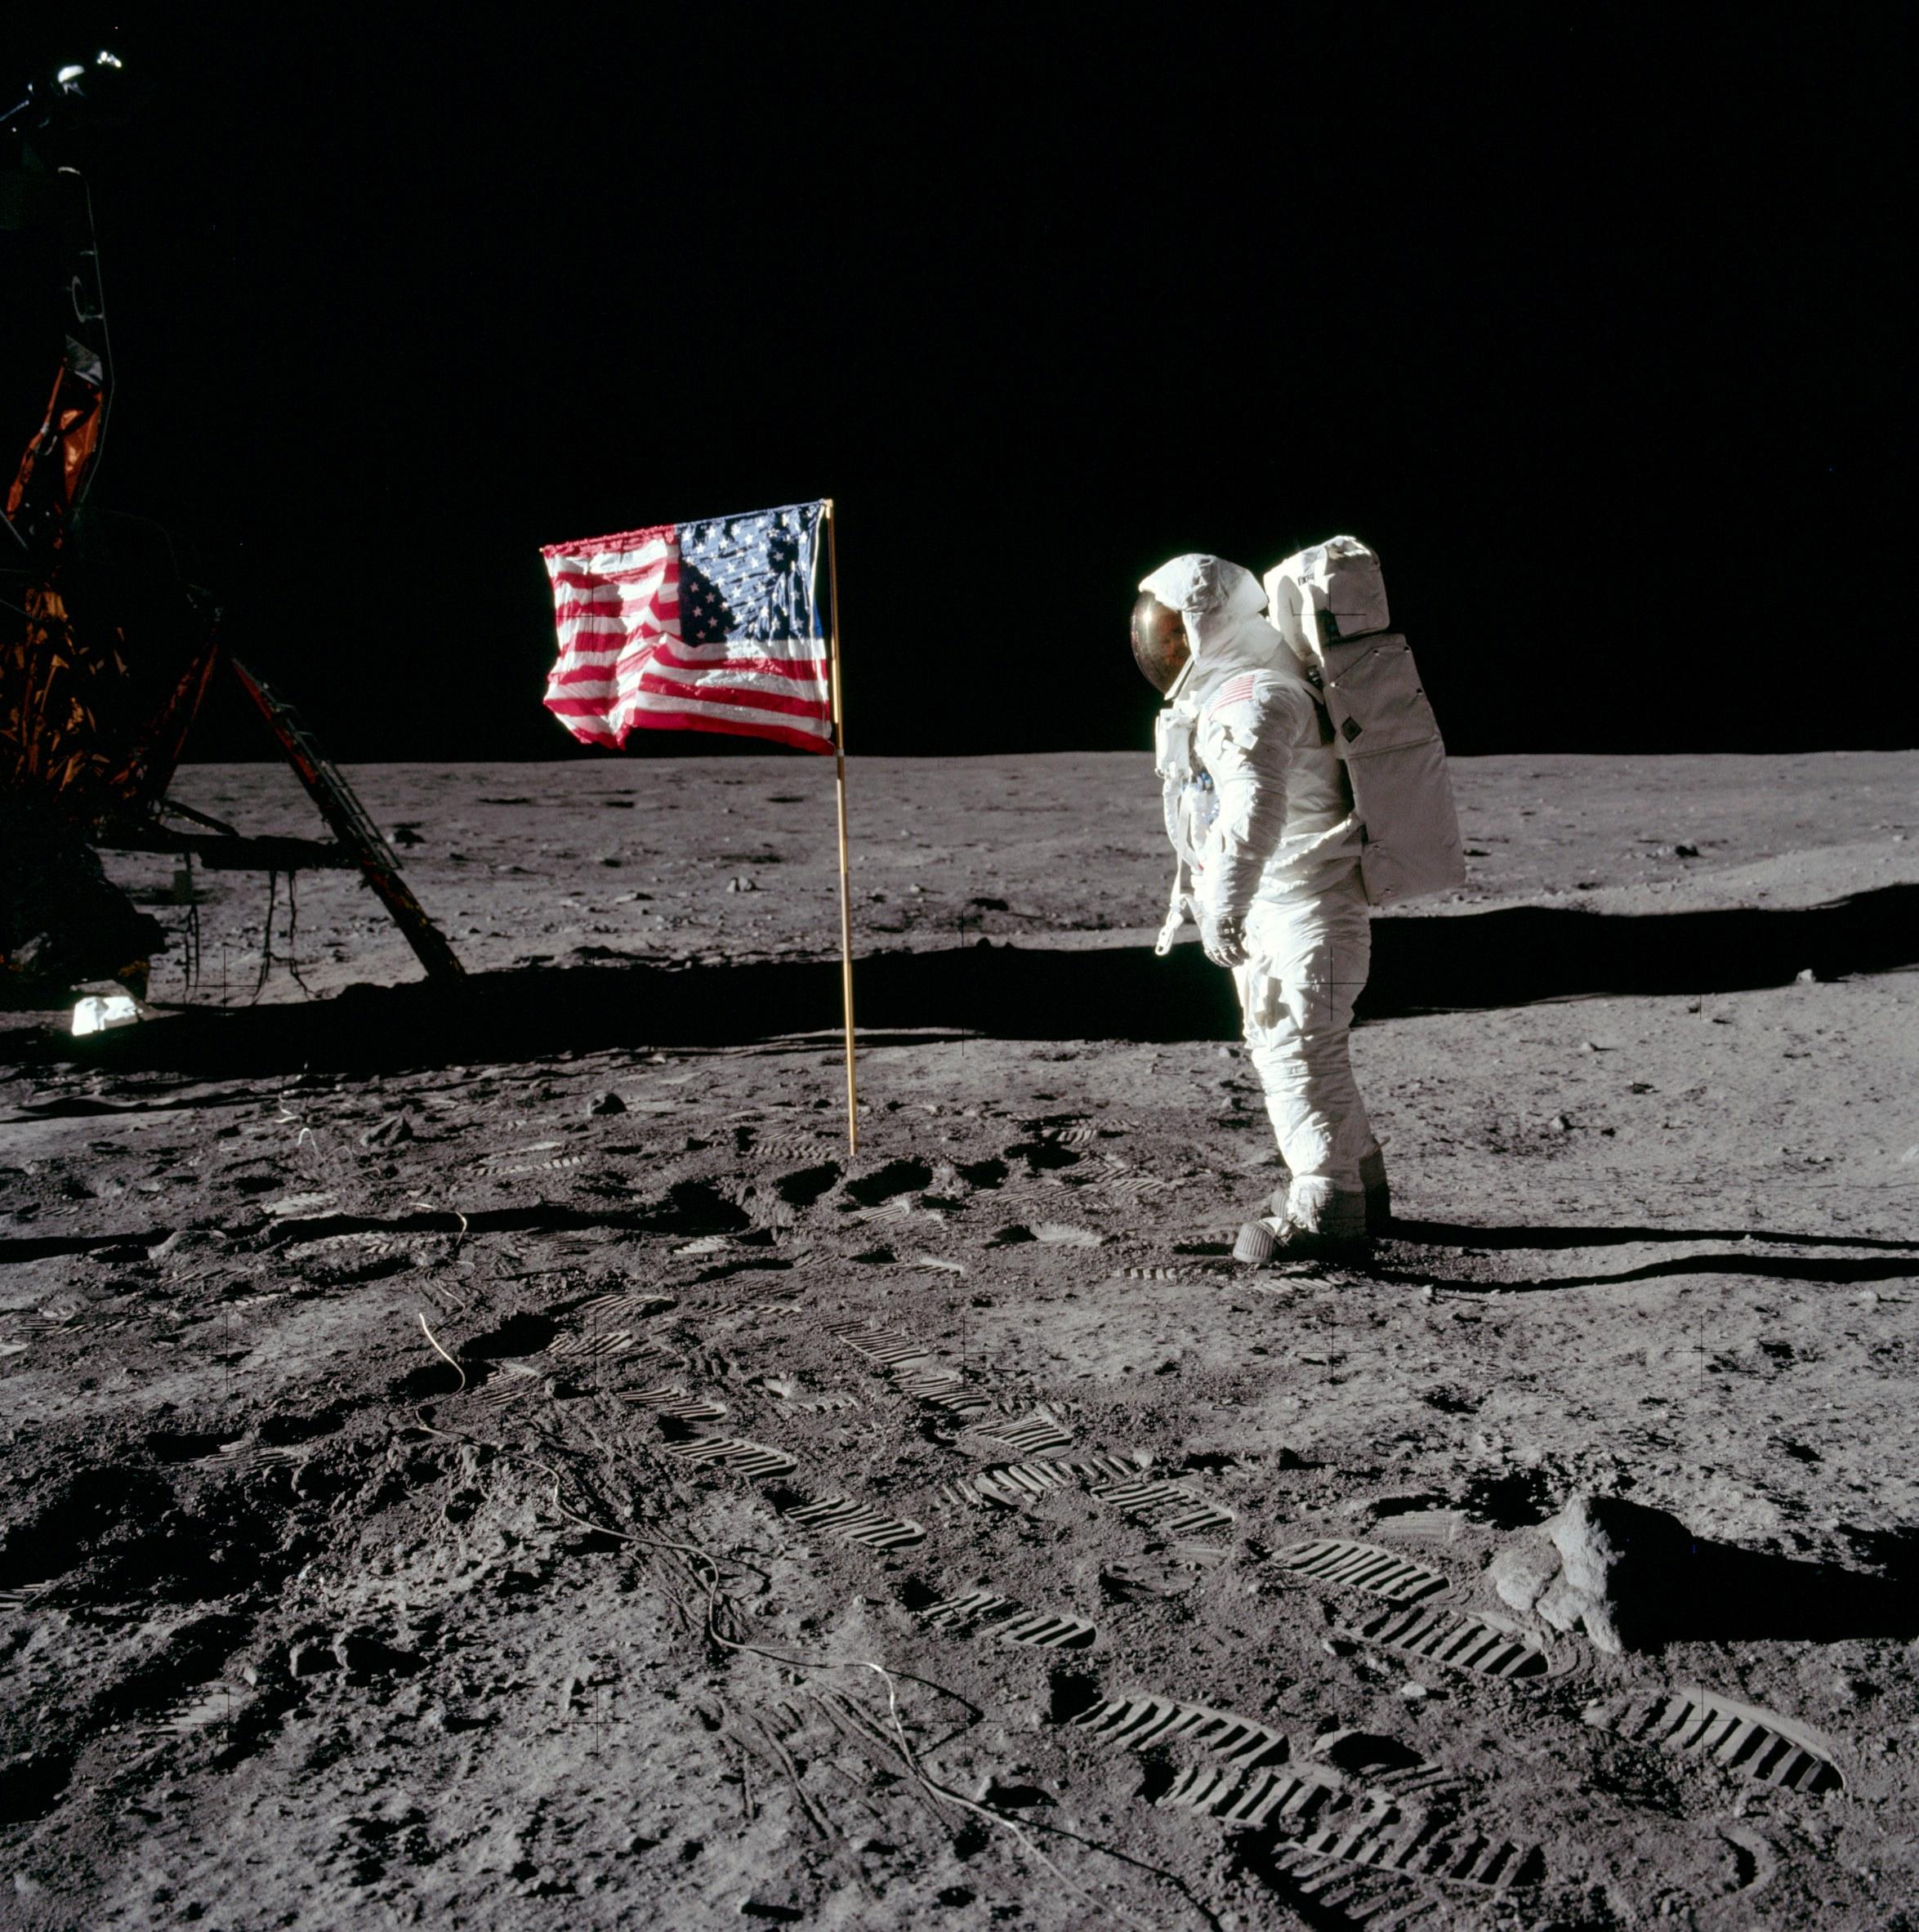 Moon Images Nasa Flag on Moon